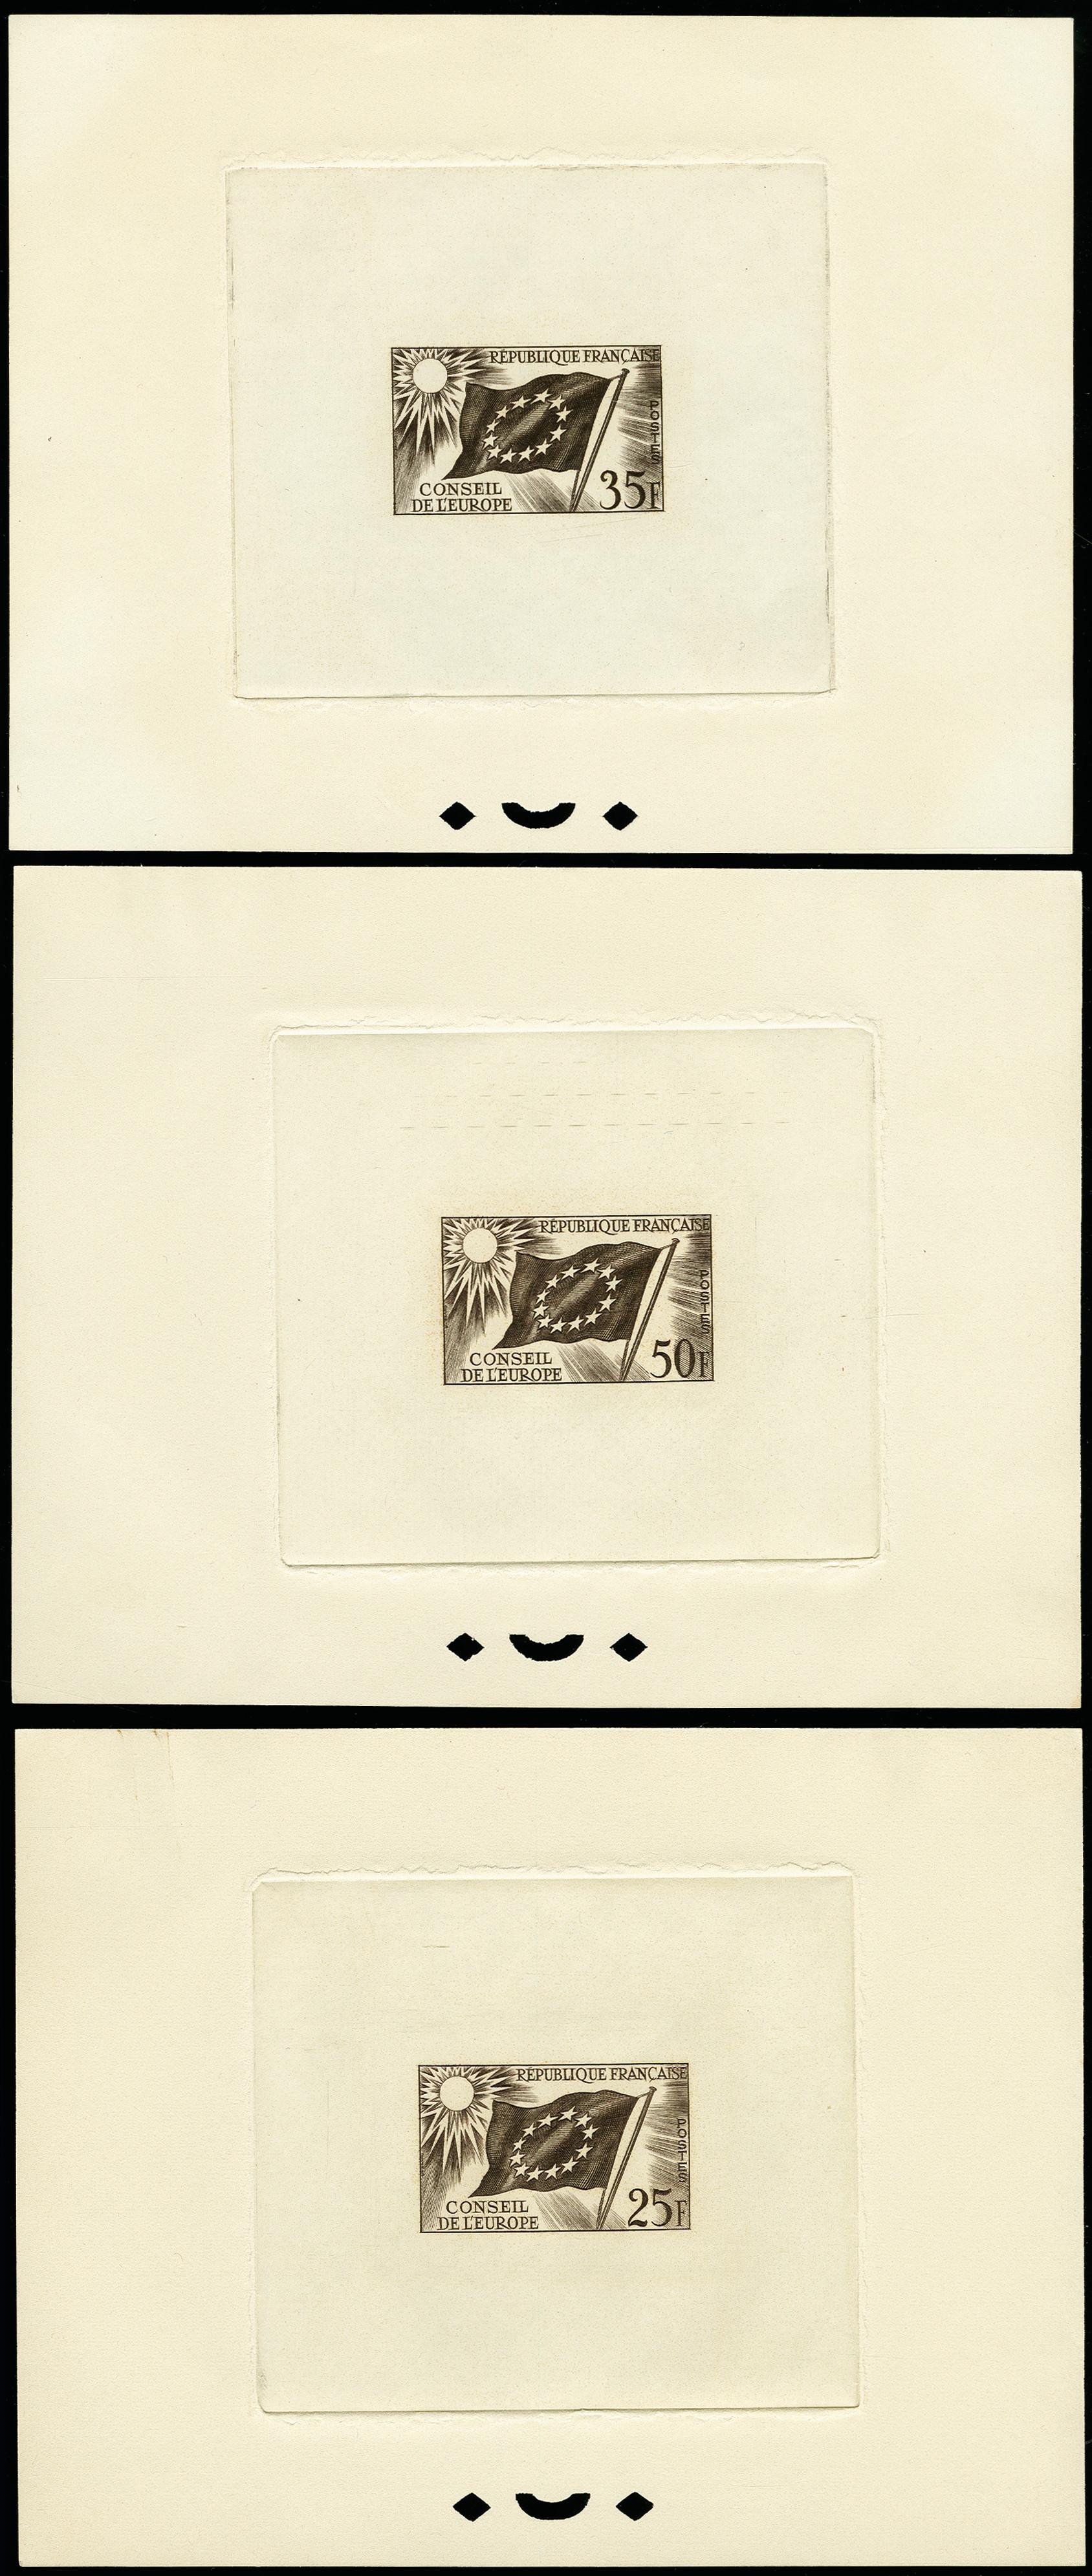 Lot 479 - France France - officials for the European Council -  Heinrich Koehler Auktionen 373rd Heinrich Köhler auction - Day 1